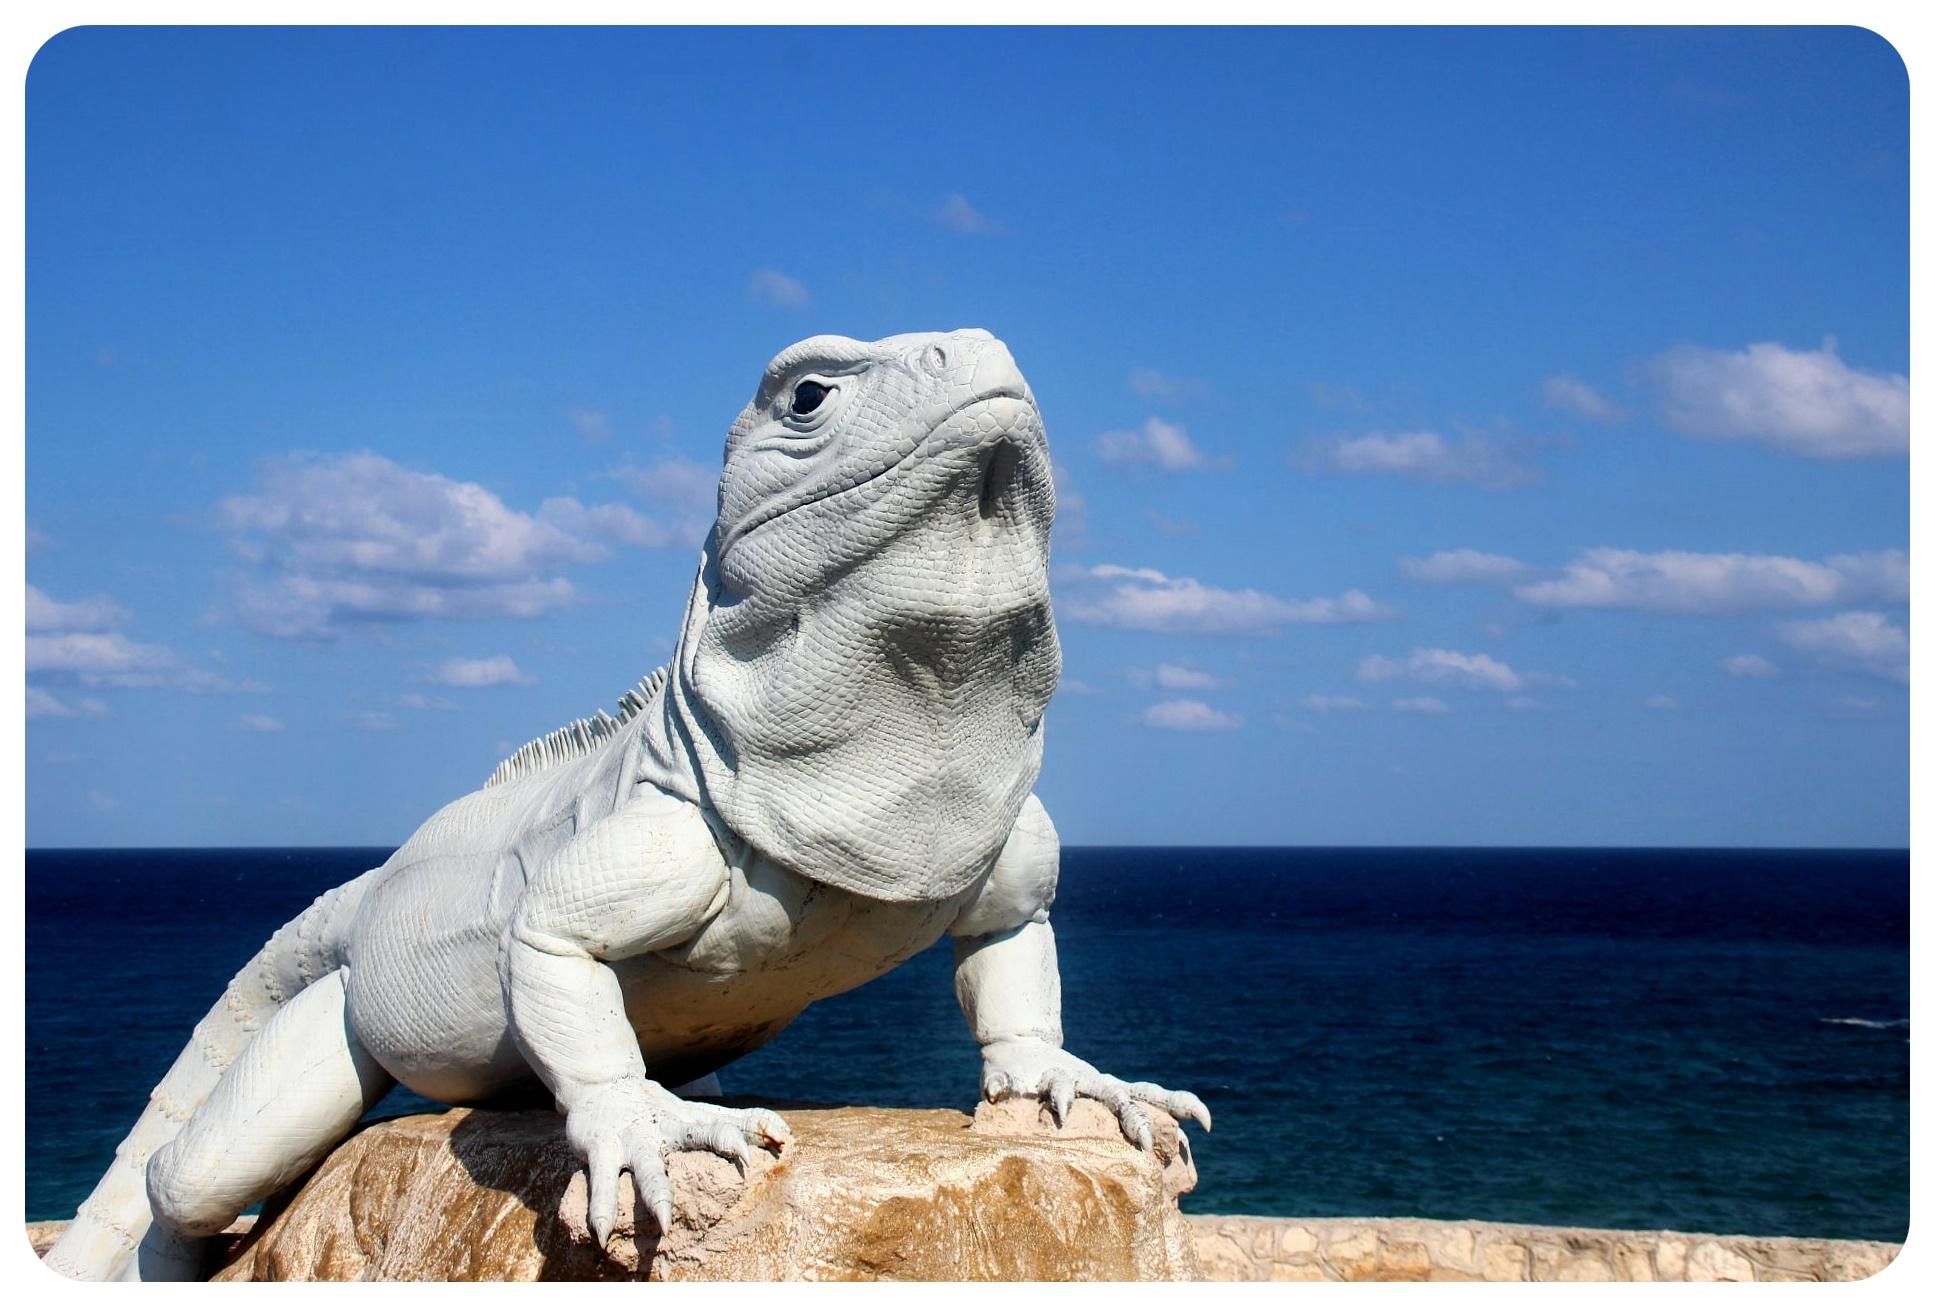 isla mujeres lizard statue